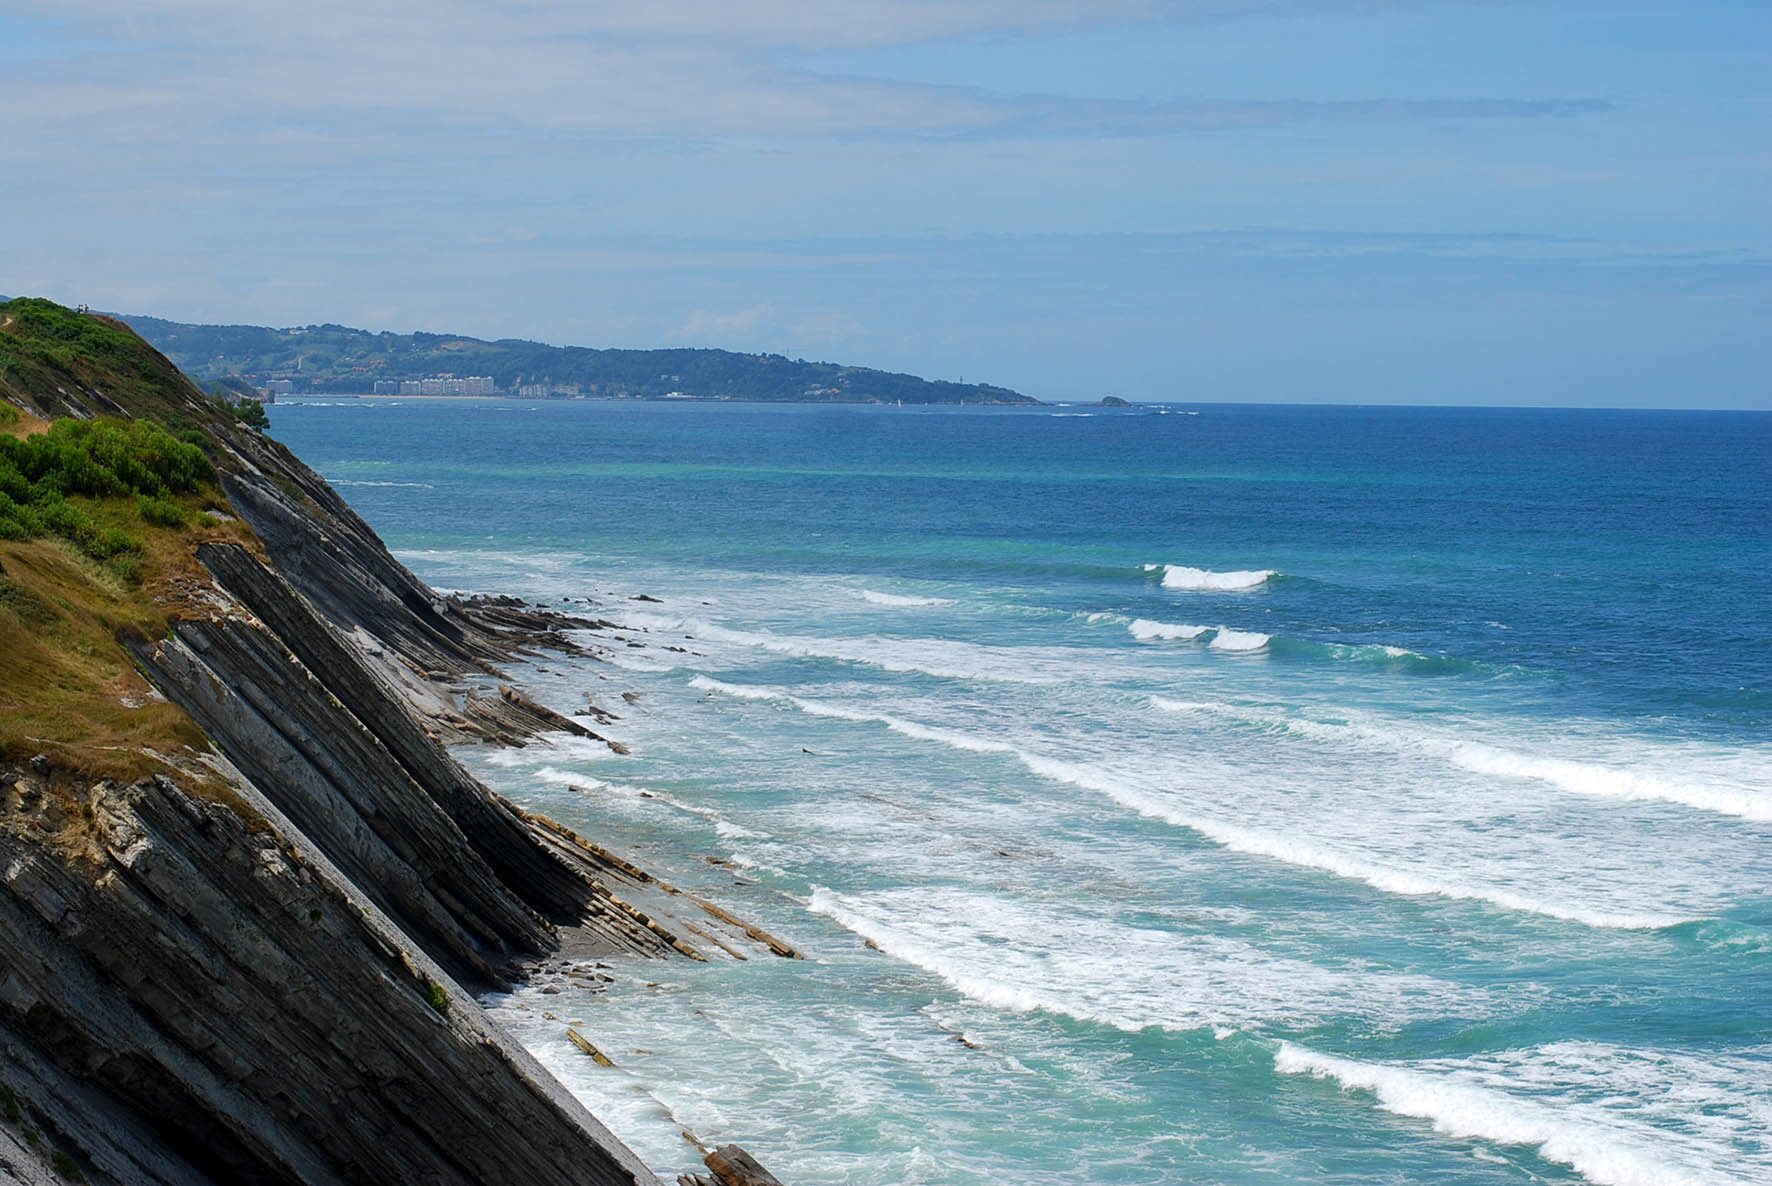 La falaise de la Corniche Basque